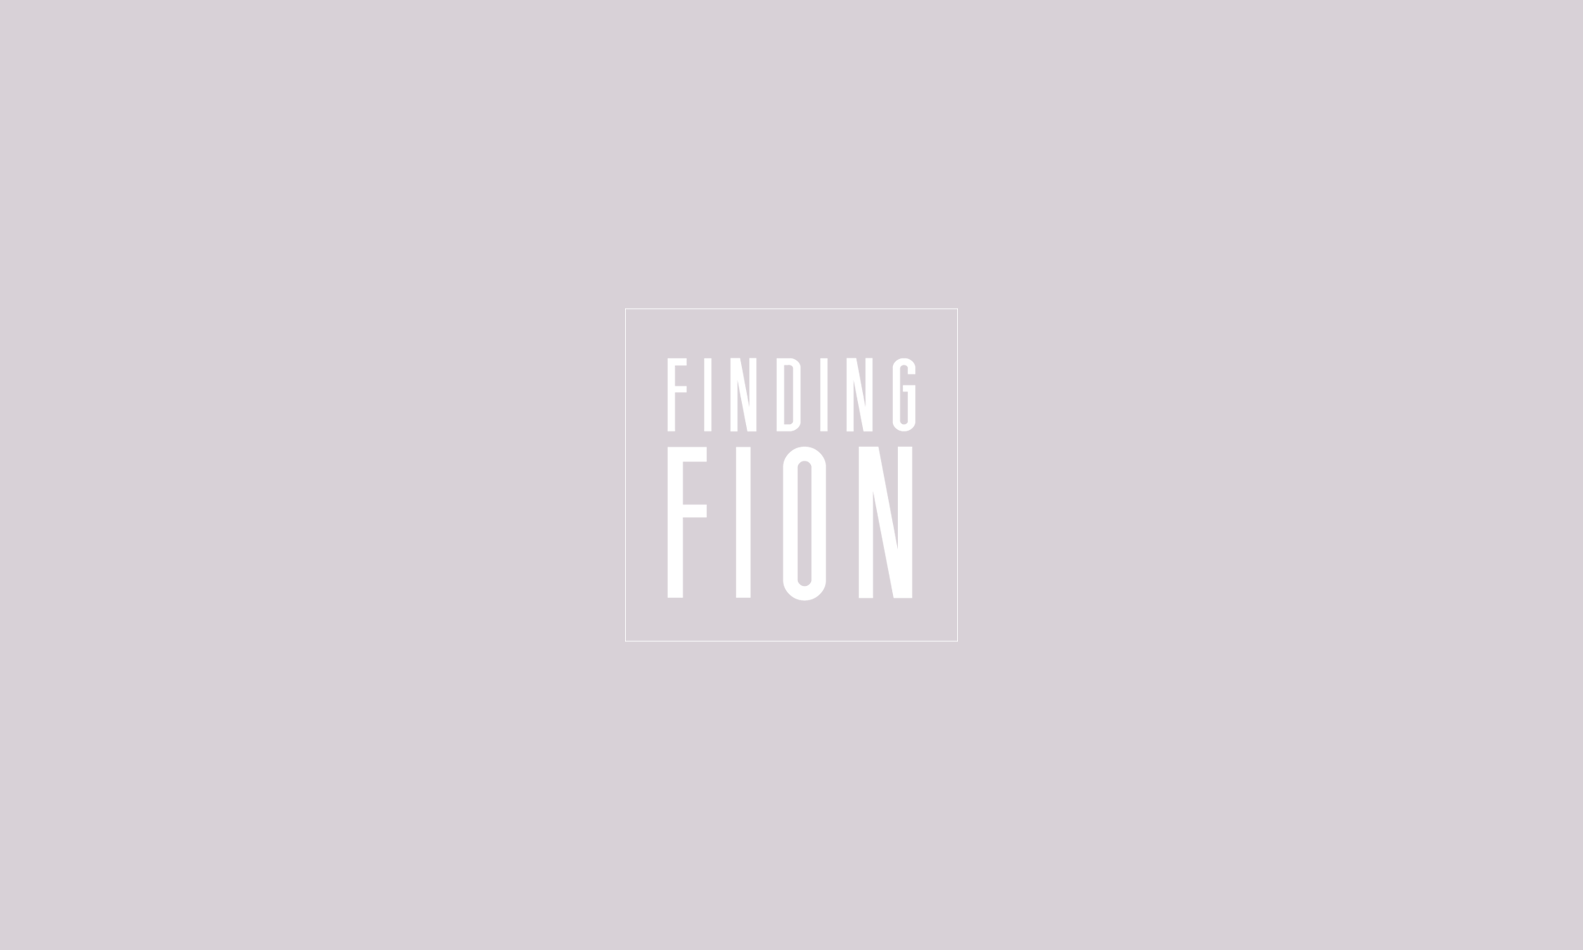 findingfionsquarelogo.png